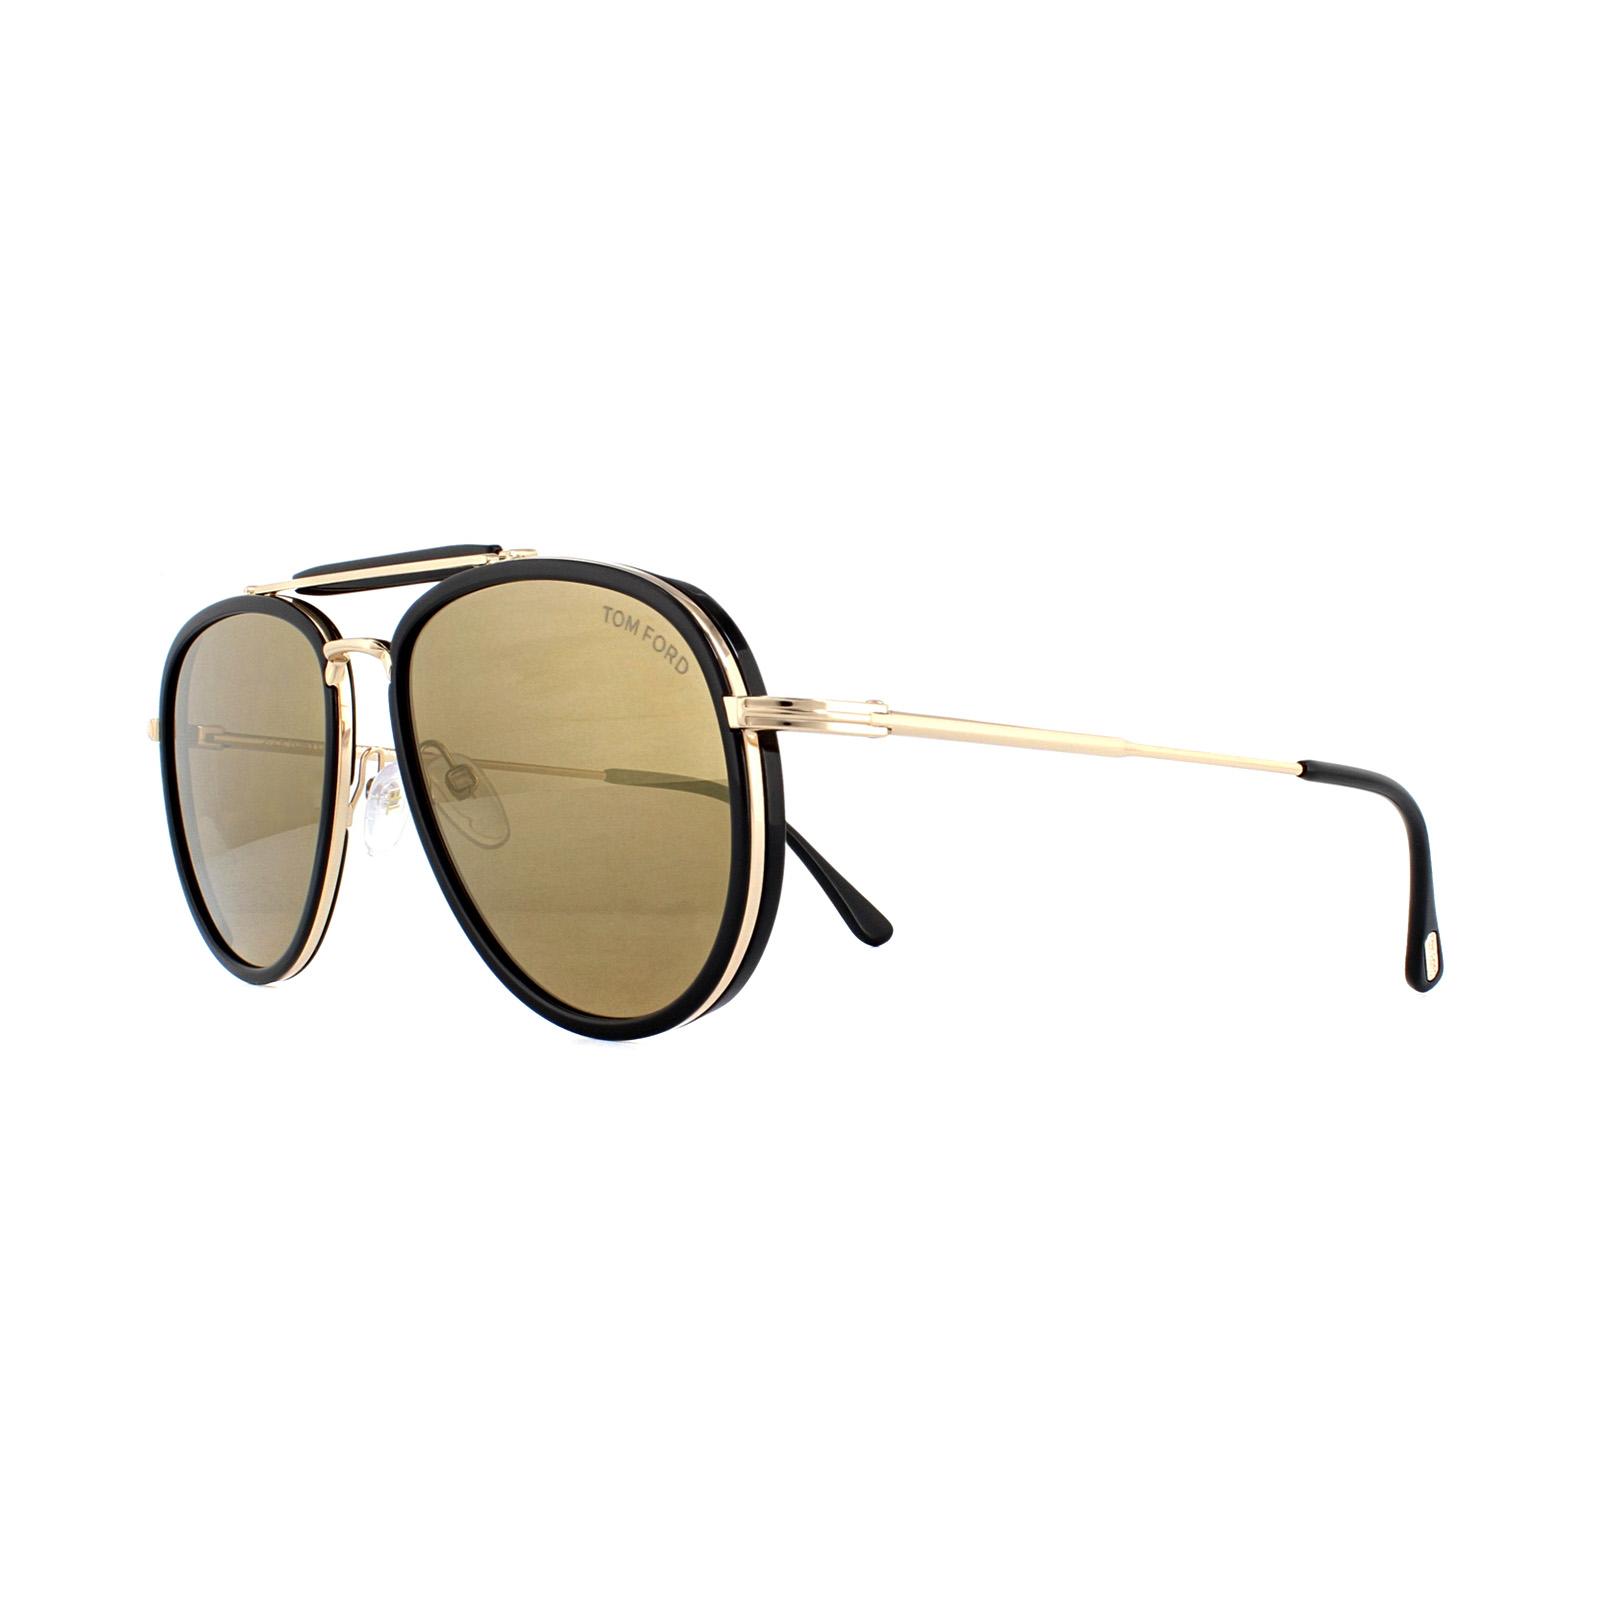 5ca87a35a41a6 Sentinel Tom Ford Sunglasses Tripp 0666 01G Shiny Black Brown Mirror